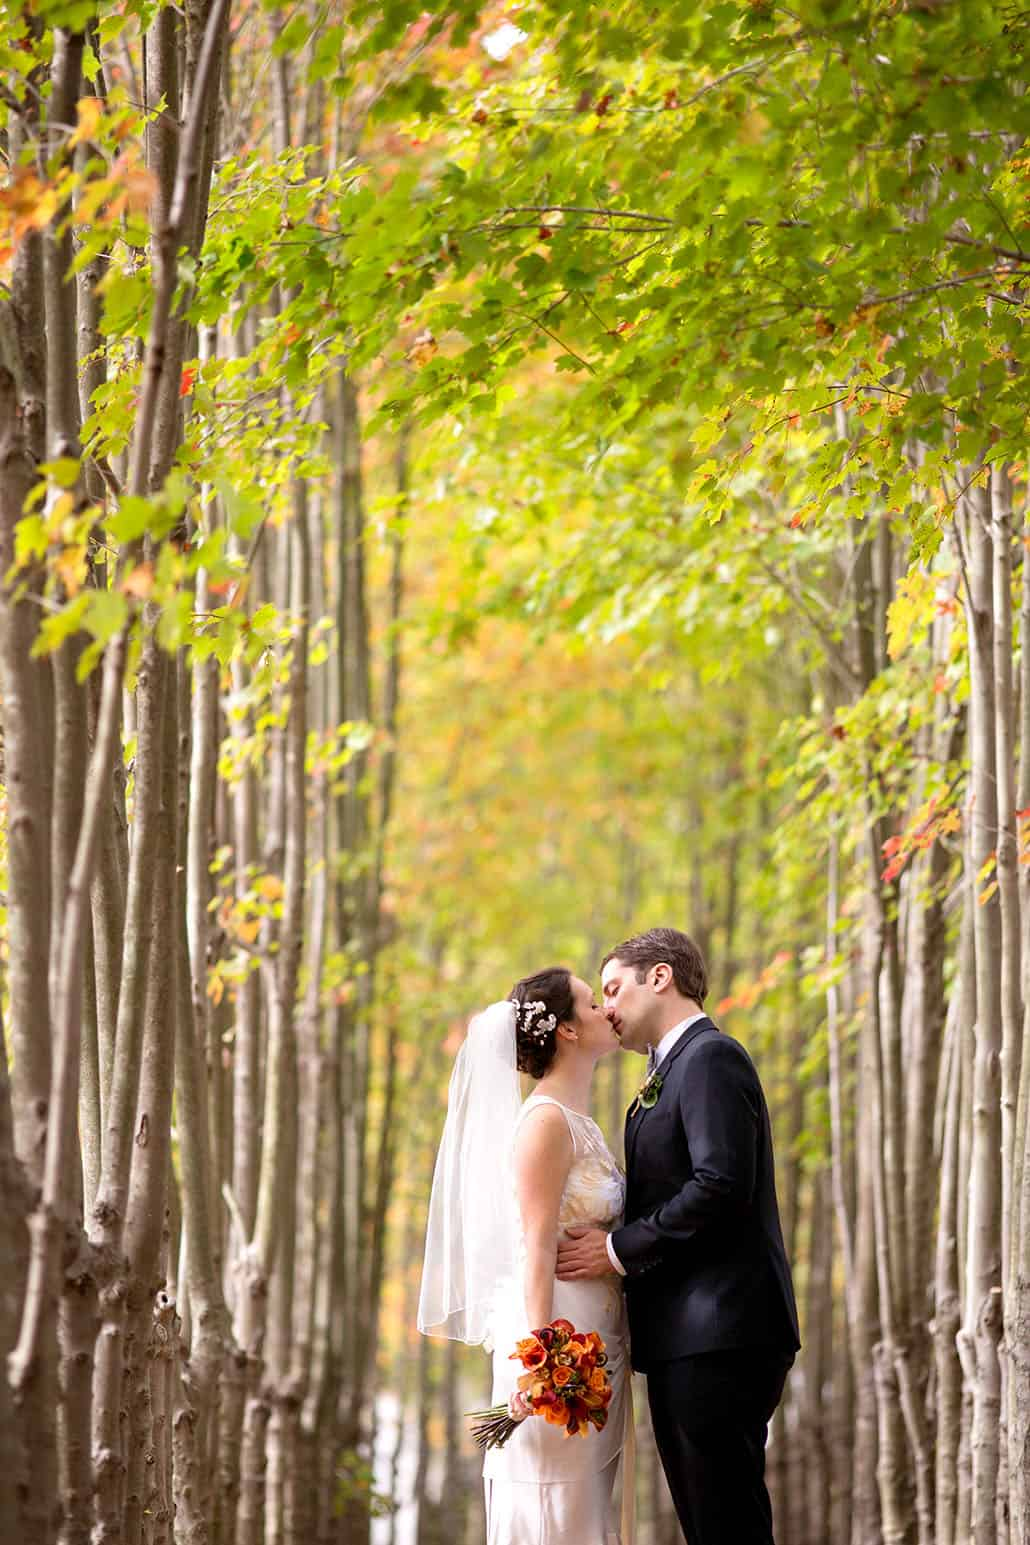 NYC and NJ documentary wedding photographer pricing